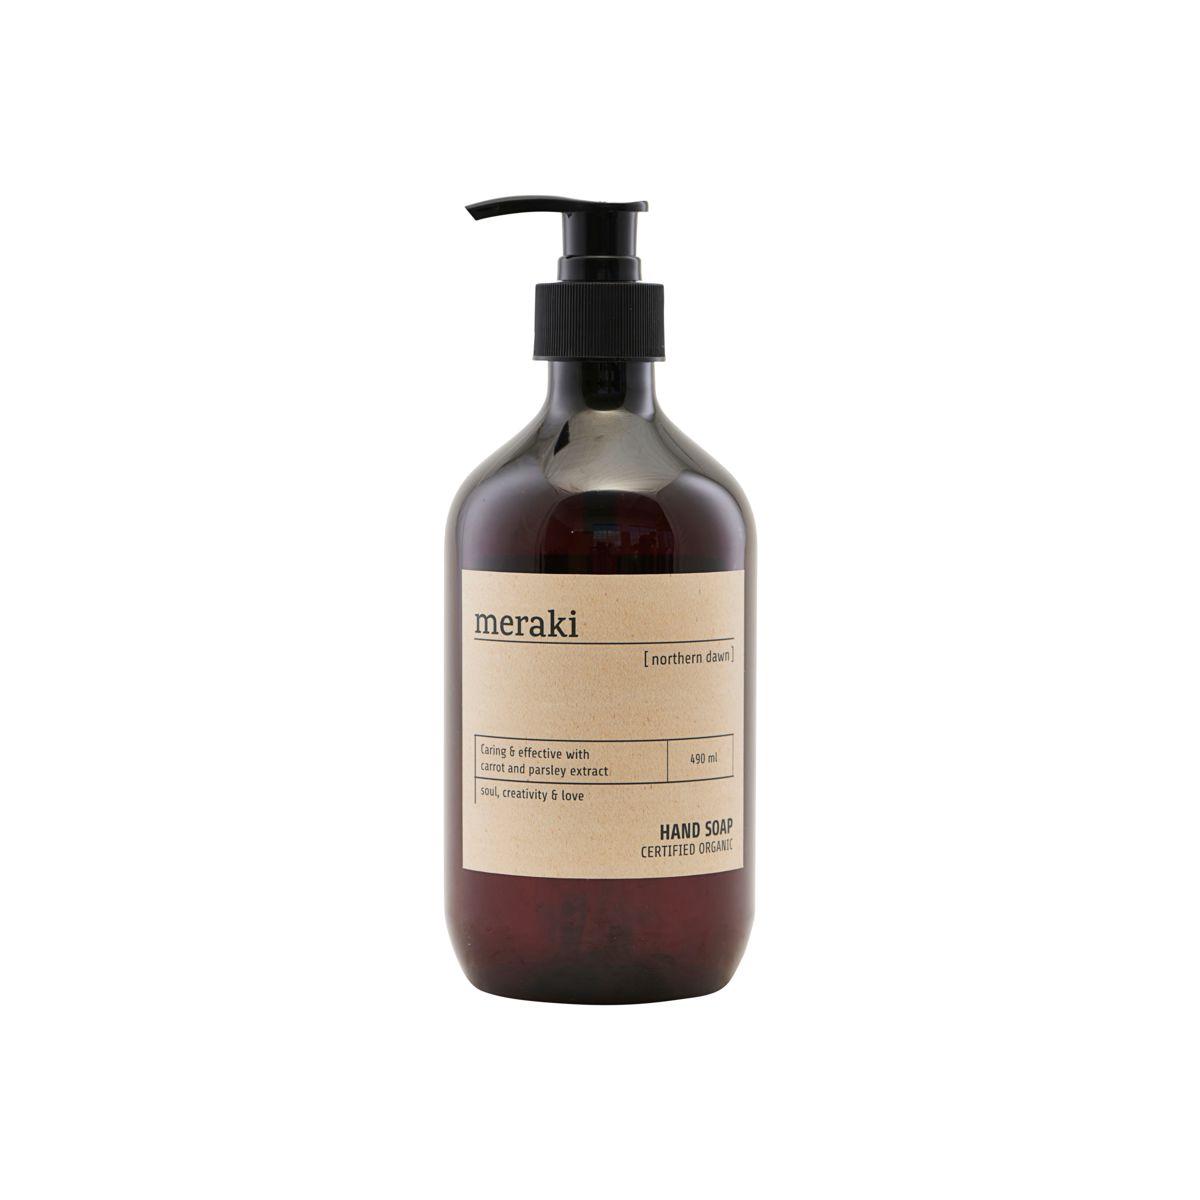 Meraki Nothern Dawn Hand Soap, 490 ml